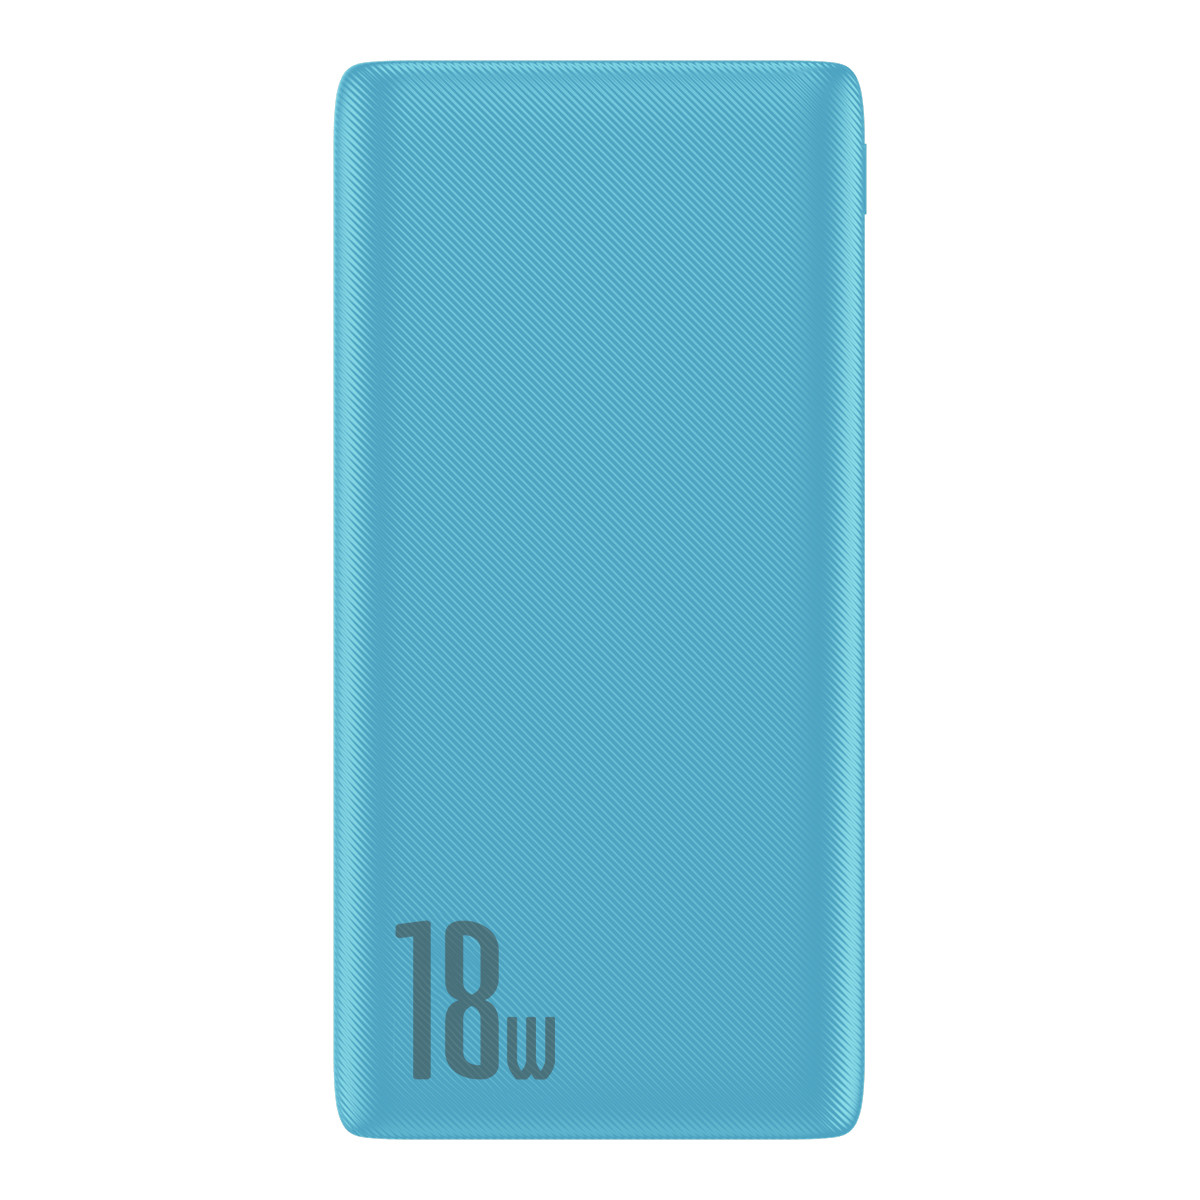 Power Bank Baseus Bipow PD+QC 10000mAh Blue - 4